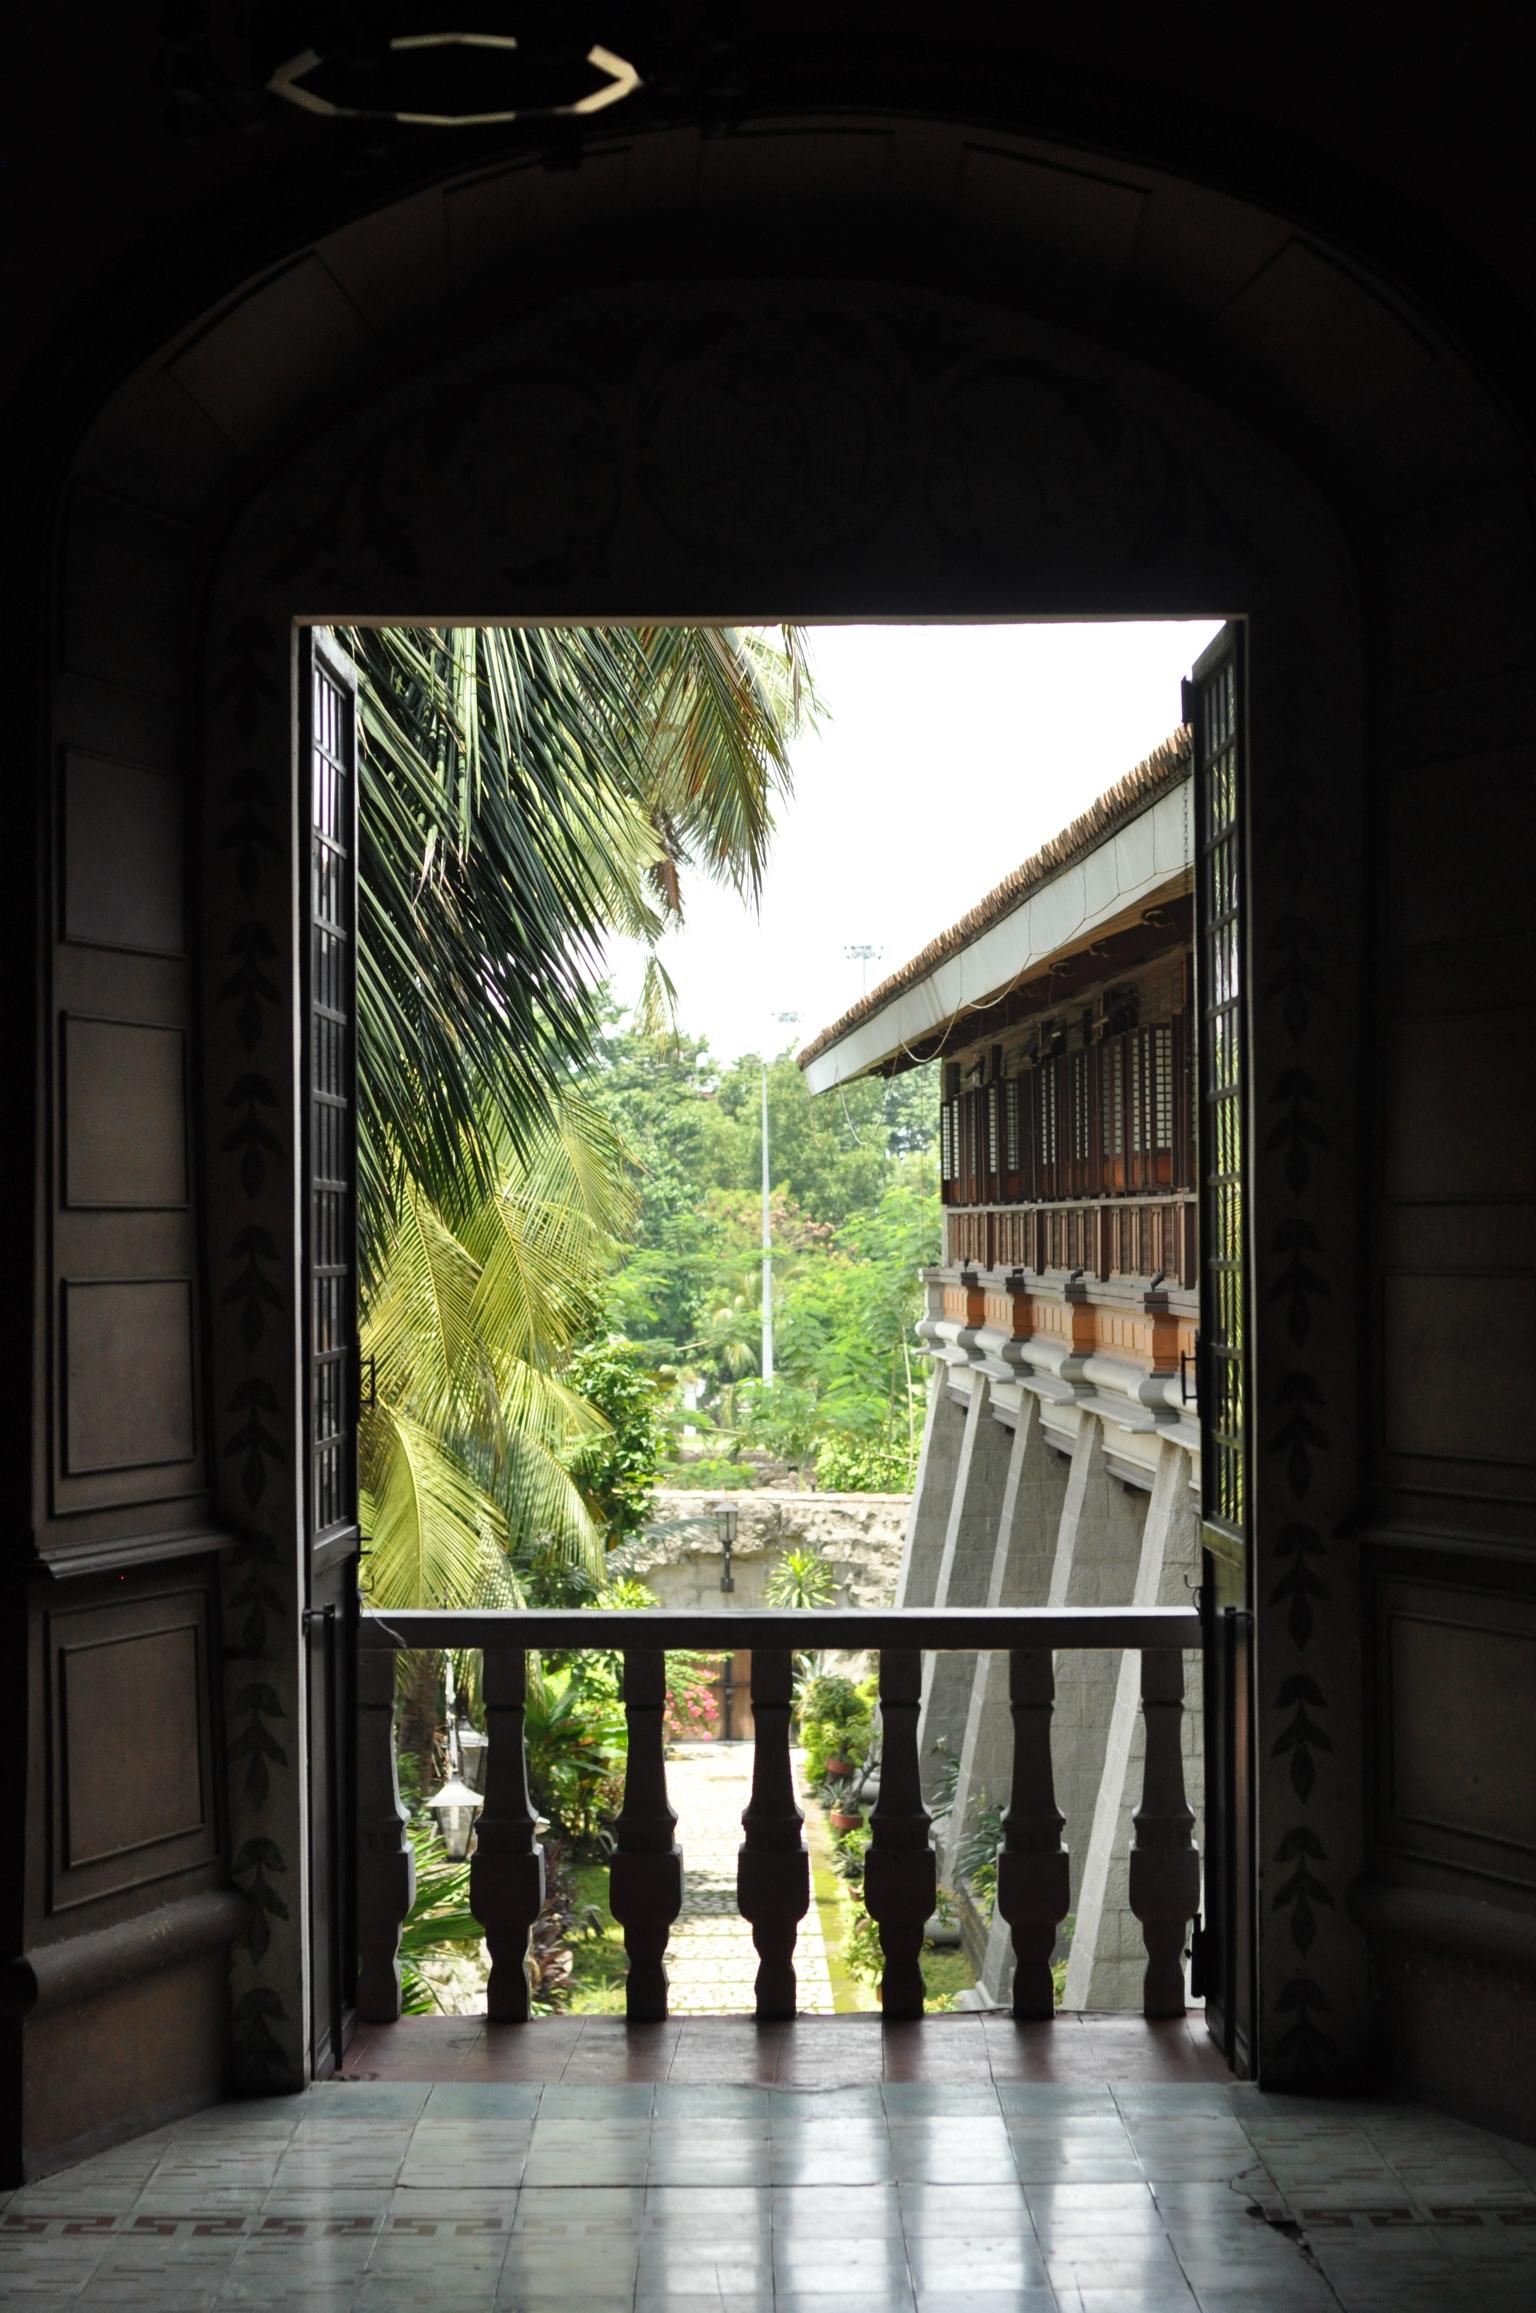 View into the courtyard in San Agustin Church, Intramuros, Manila Philippines